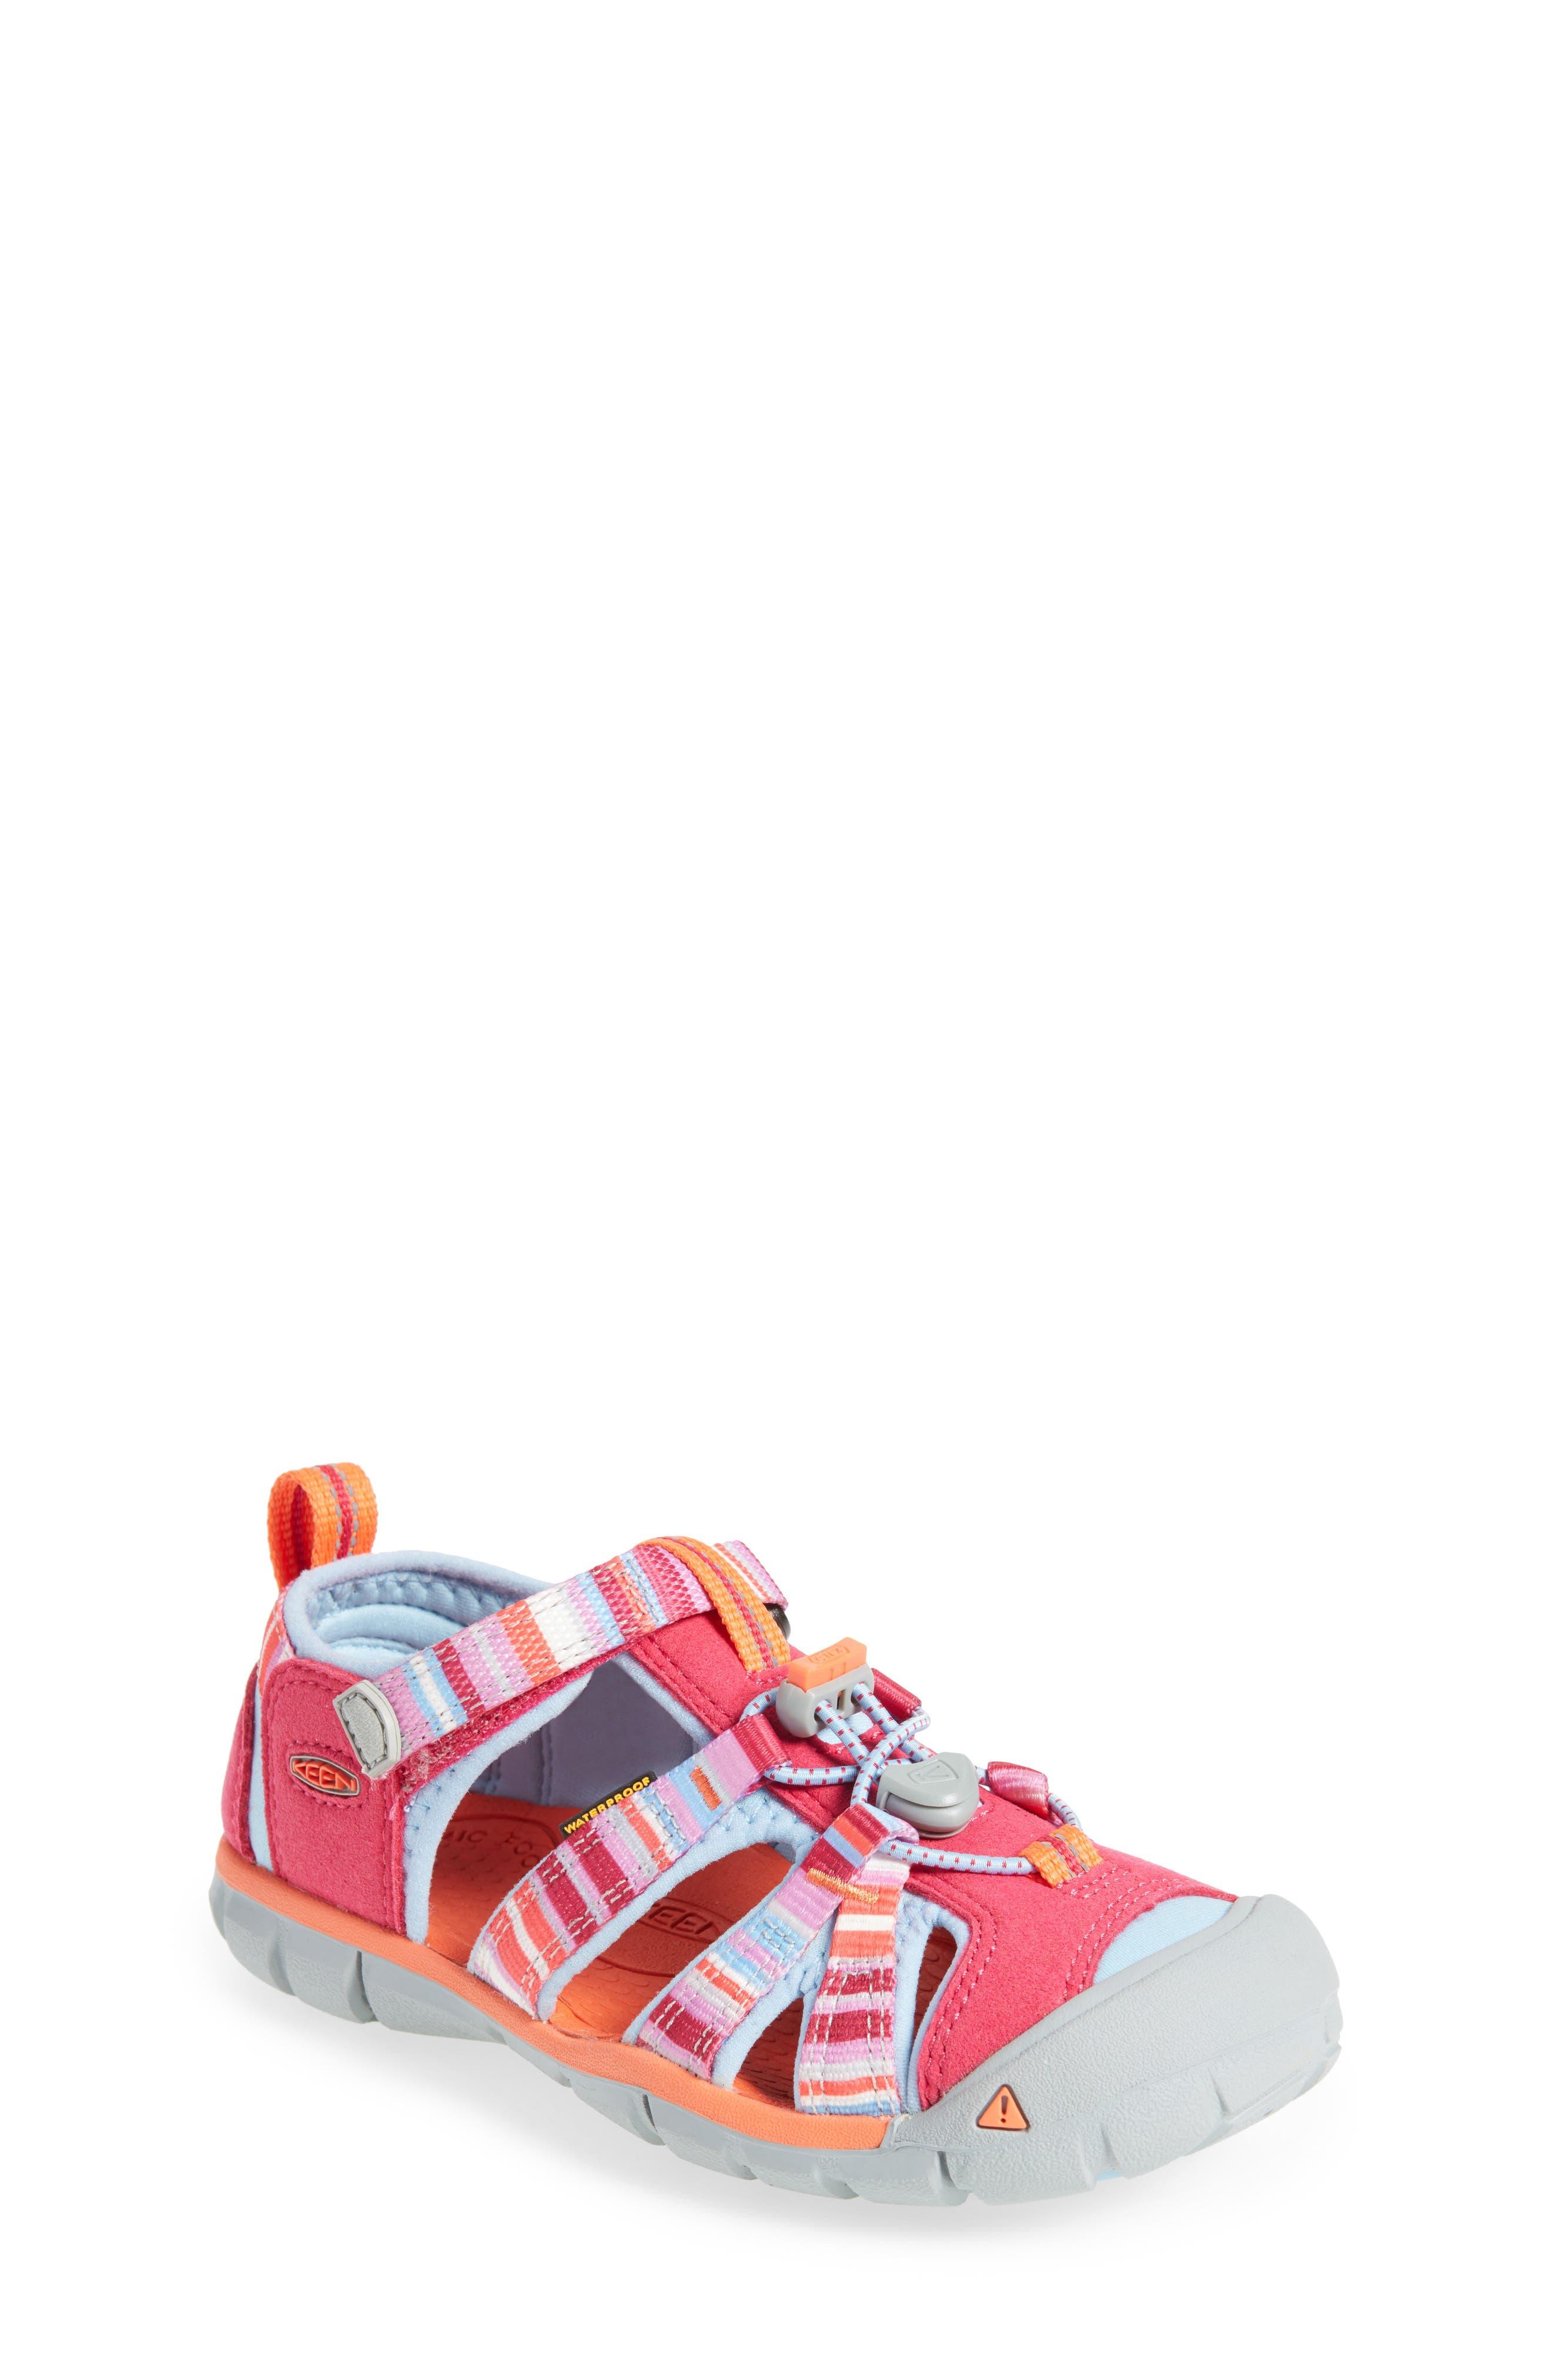 ,                             'Seacamp II' Water Friendly Sandal,                             Main thumbnail 80, color,                             658